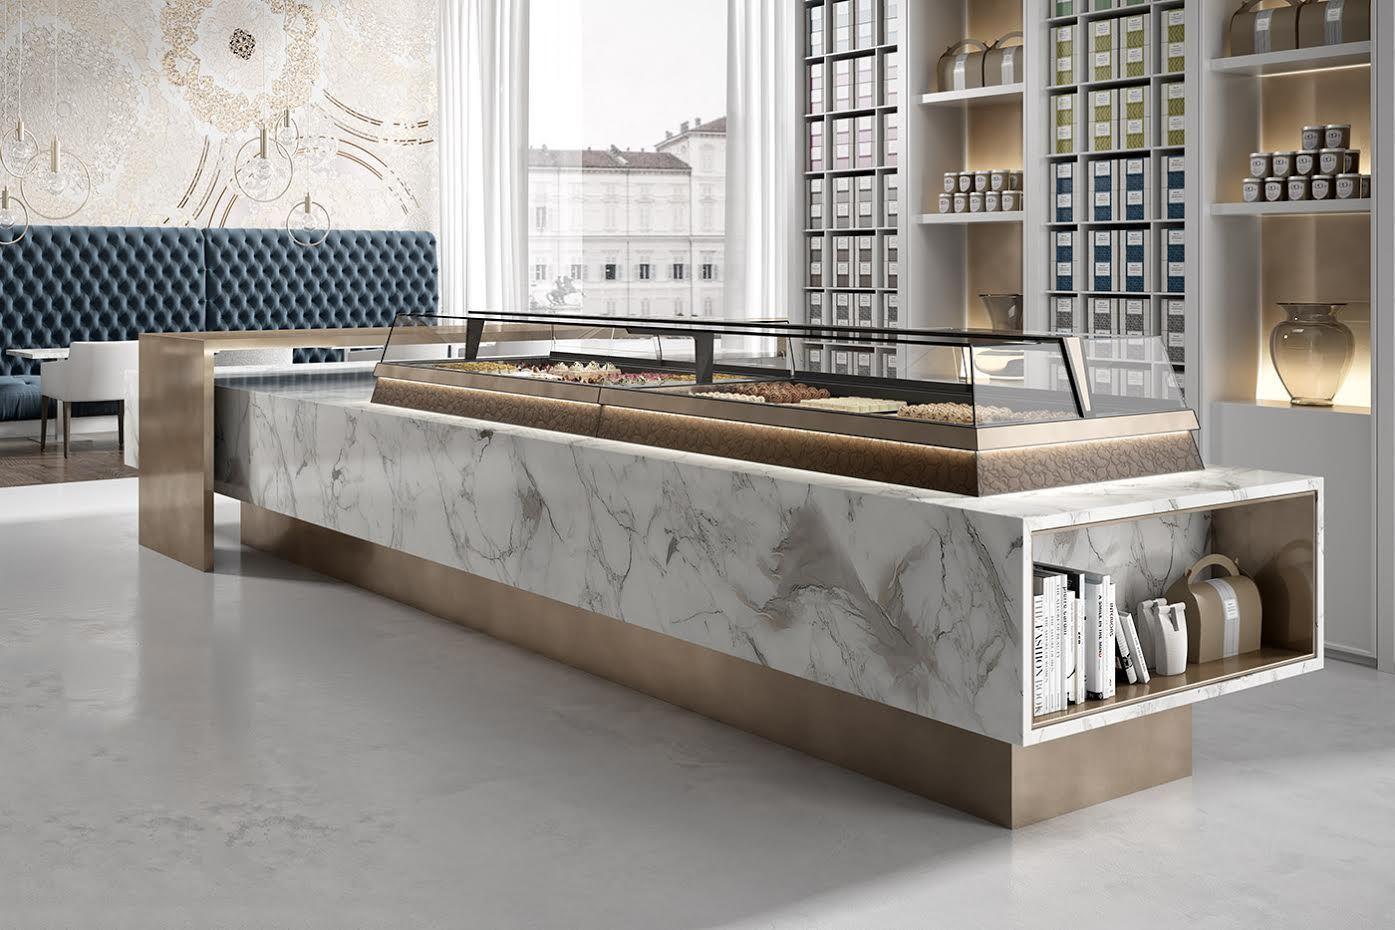 Vetrina Orion Jobs | Restaurant design, Counter design ...